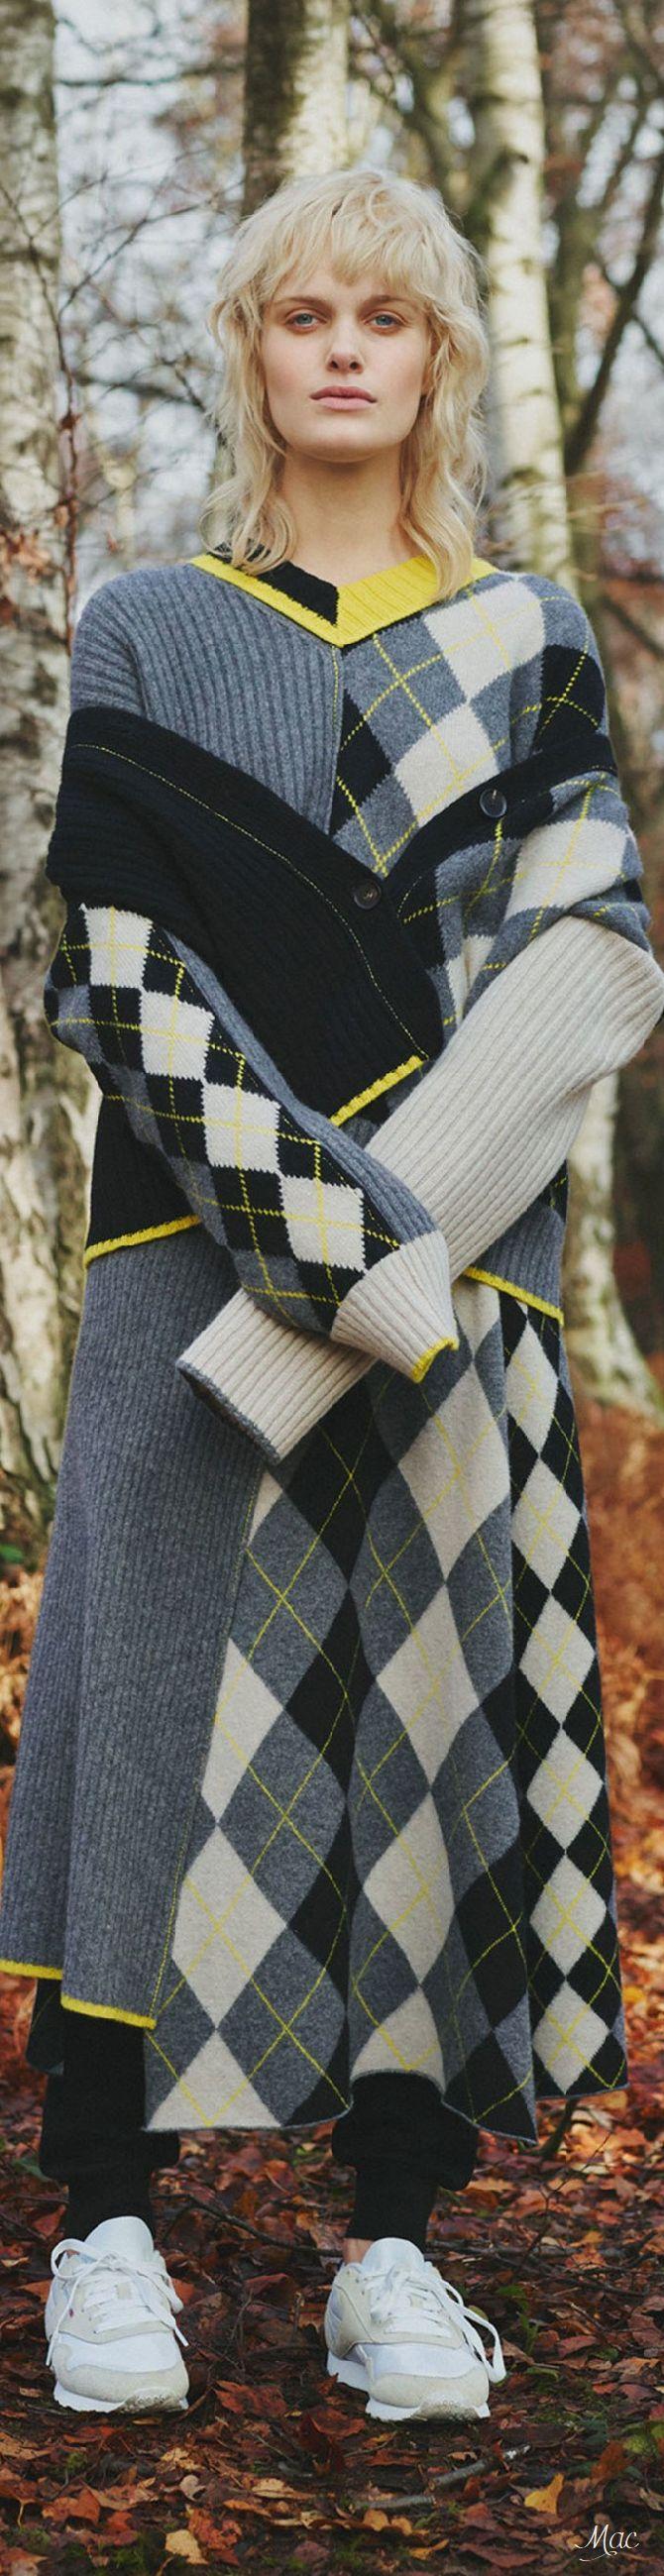 Argyle Intarsia | Pre-Fall 2018 Pringle of Scotland | Patchwork Sweater #knitspiration